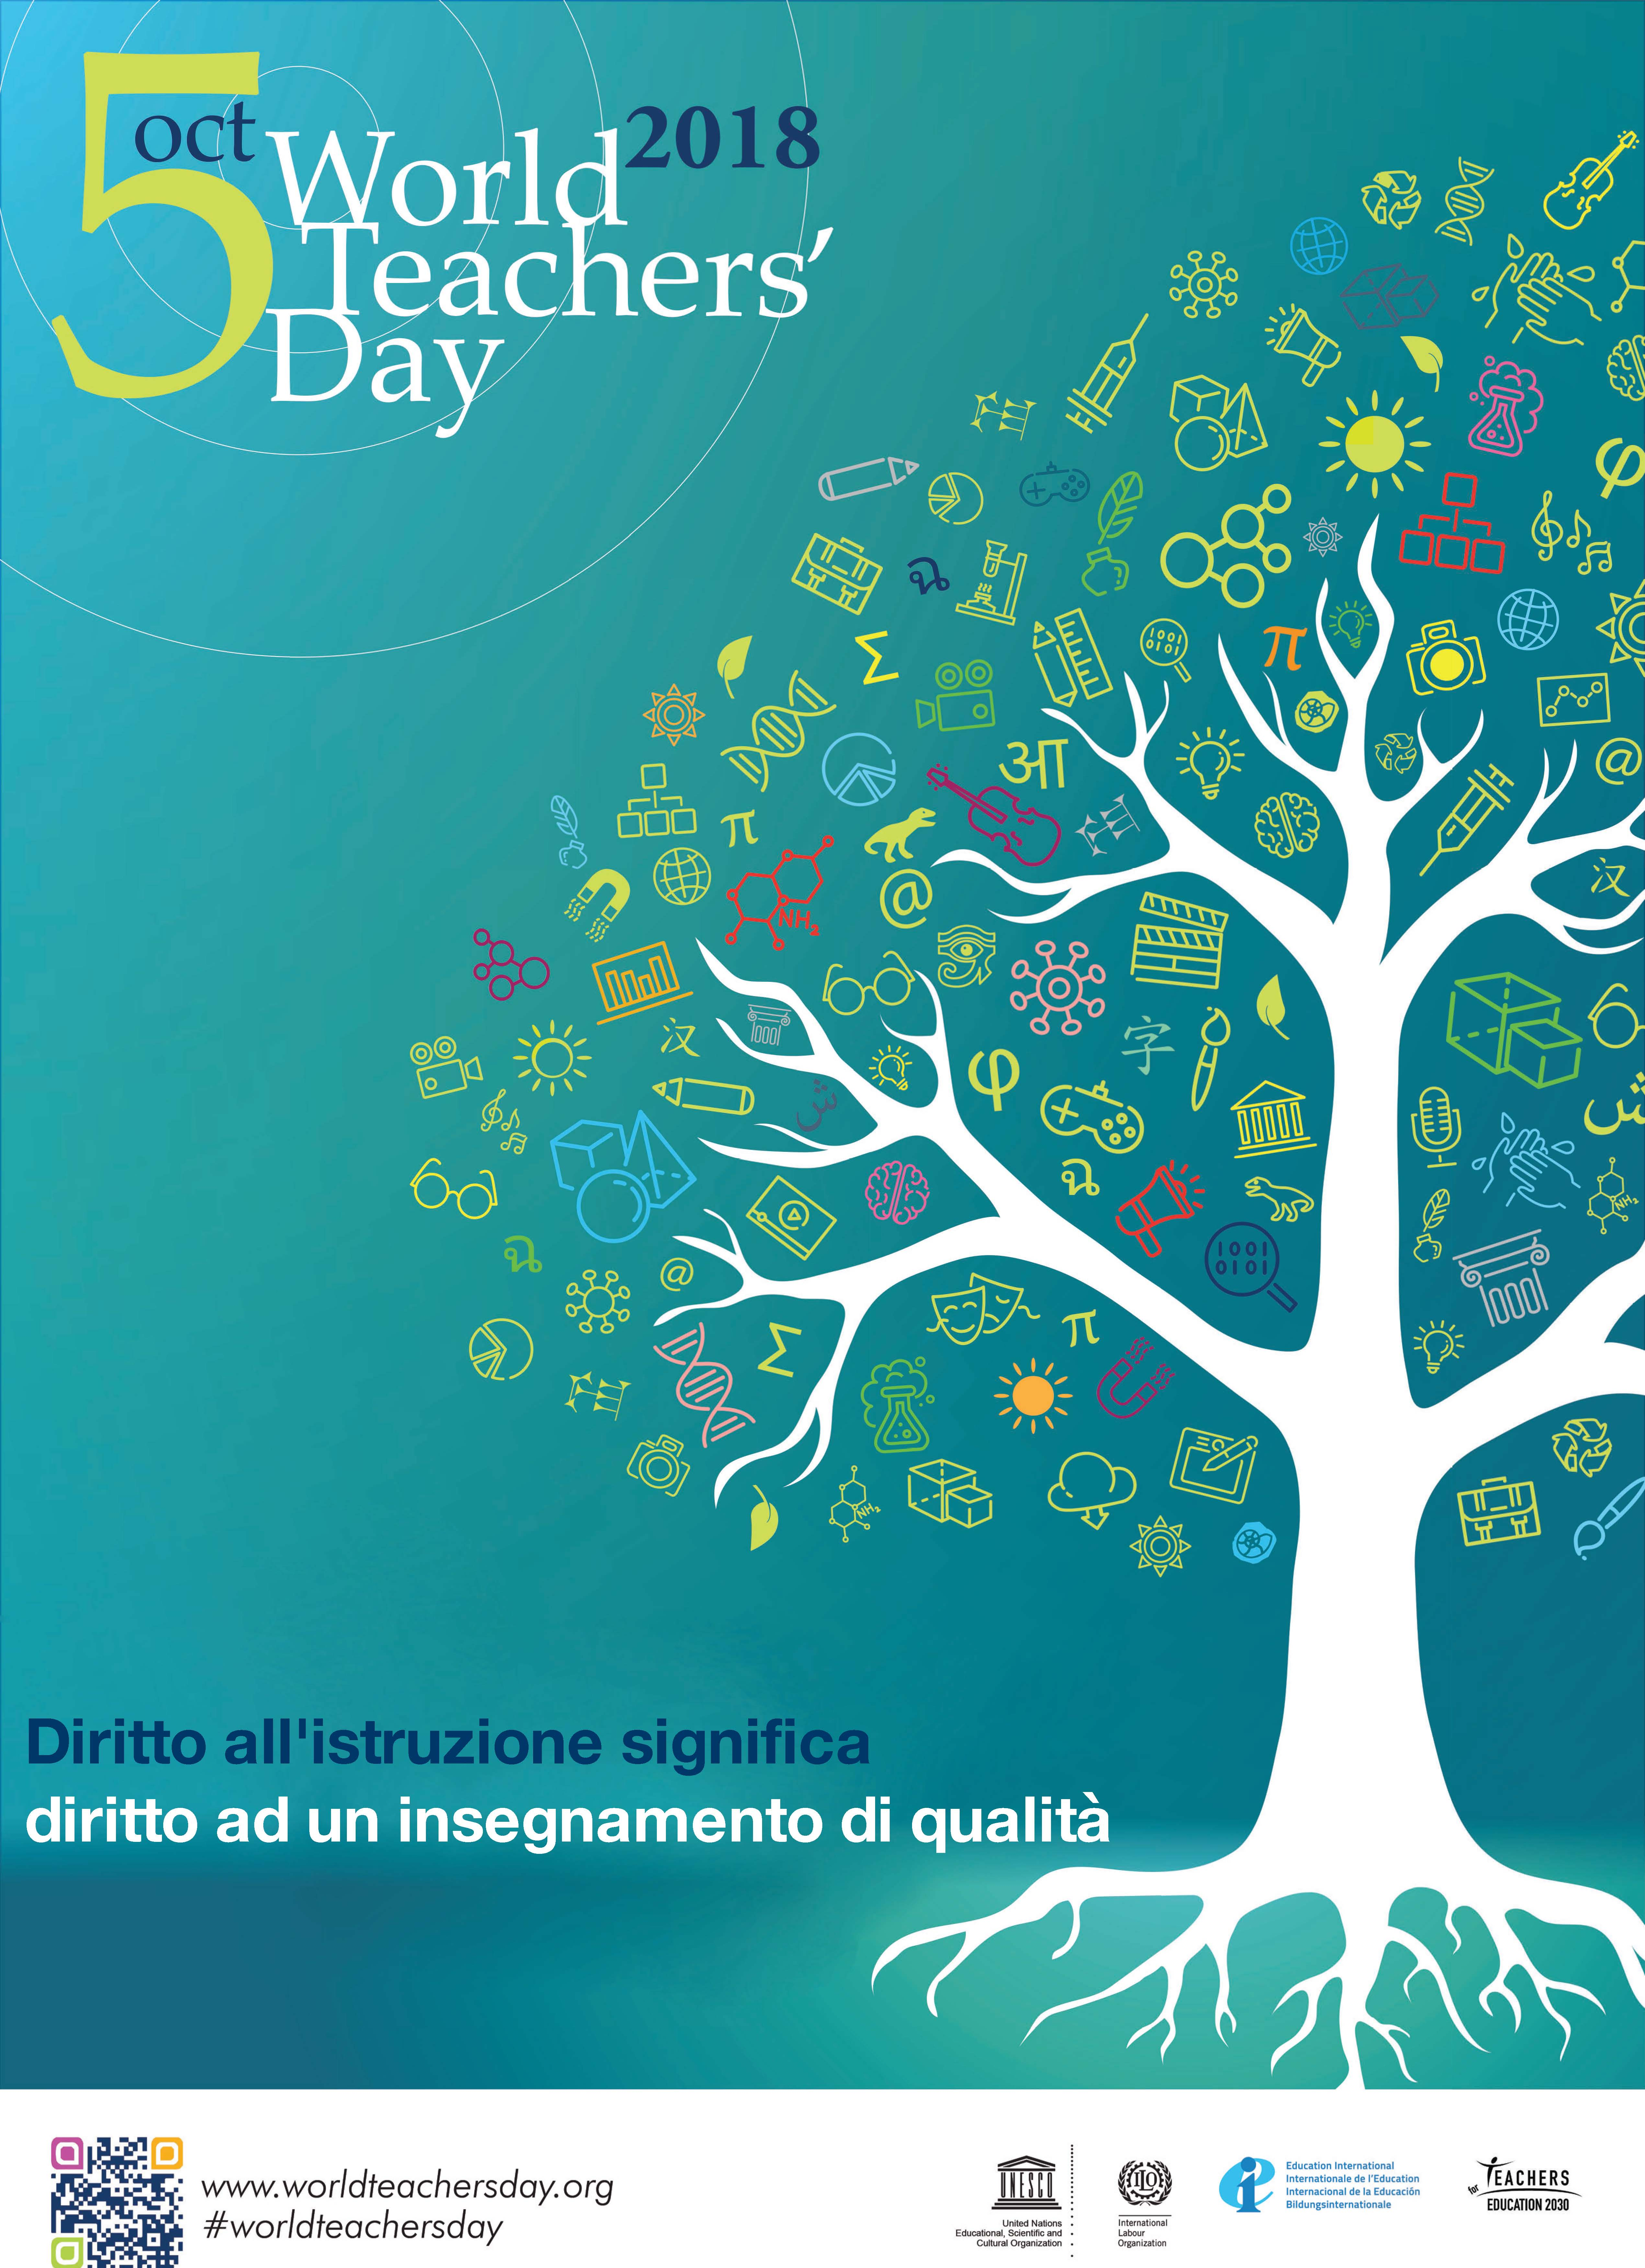 5 ottobre | Giornata mondiale degli insegnanti